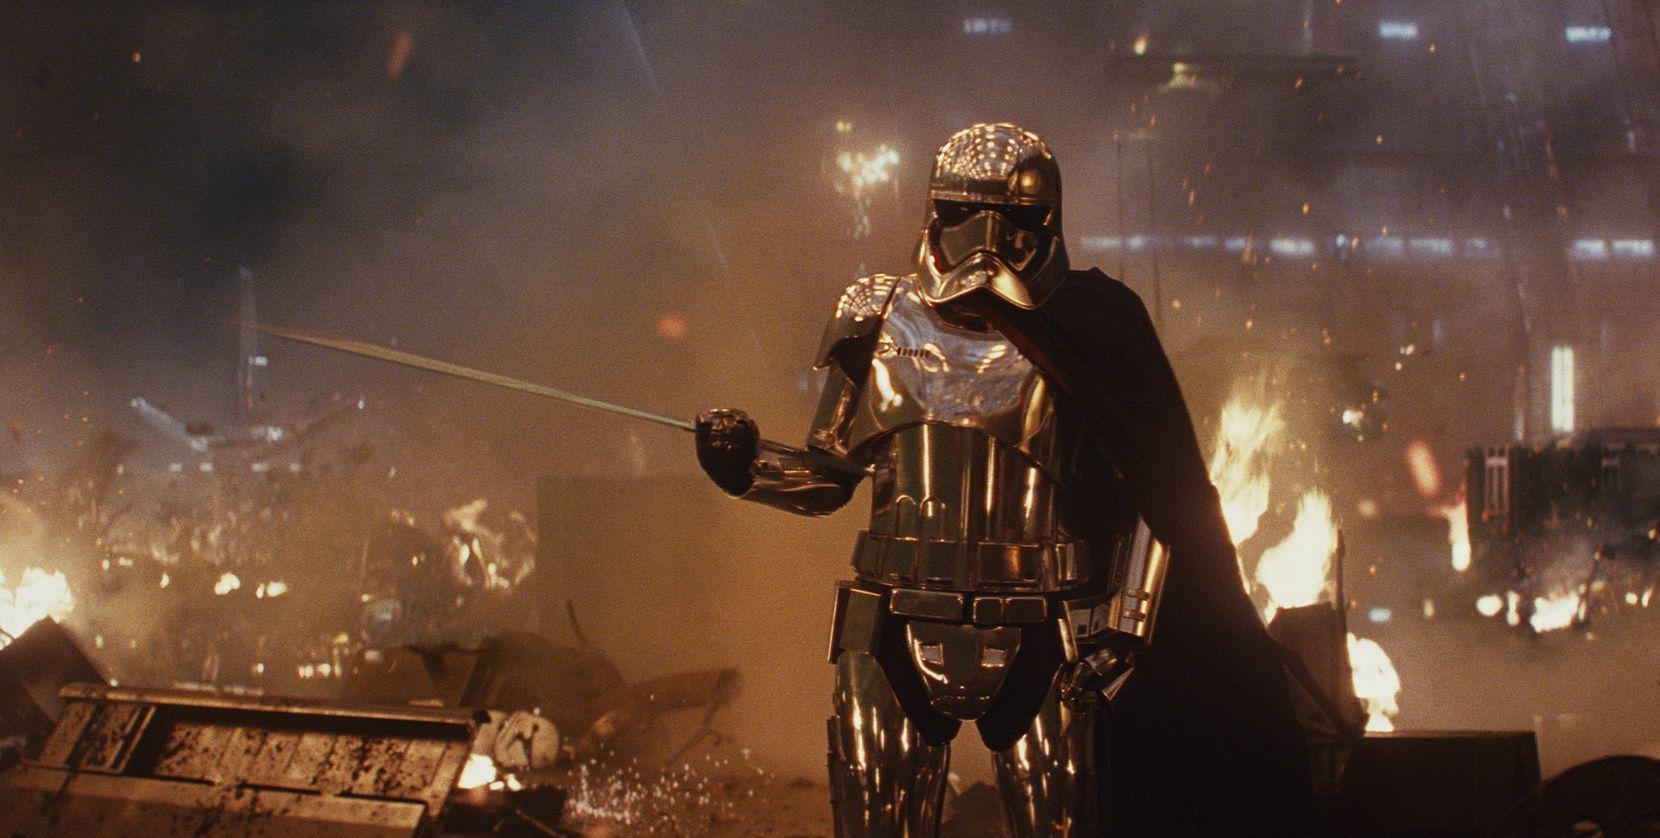 Star Wars: The Last Jedi se estrena el 15 de diciembre oficialmente. LucasFilm.